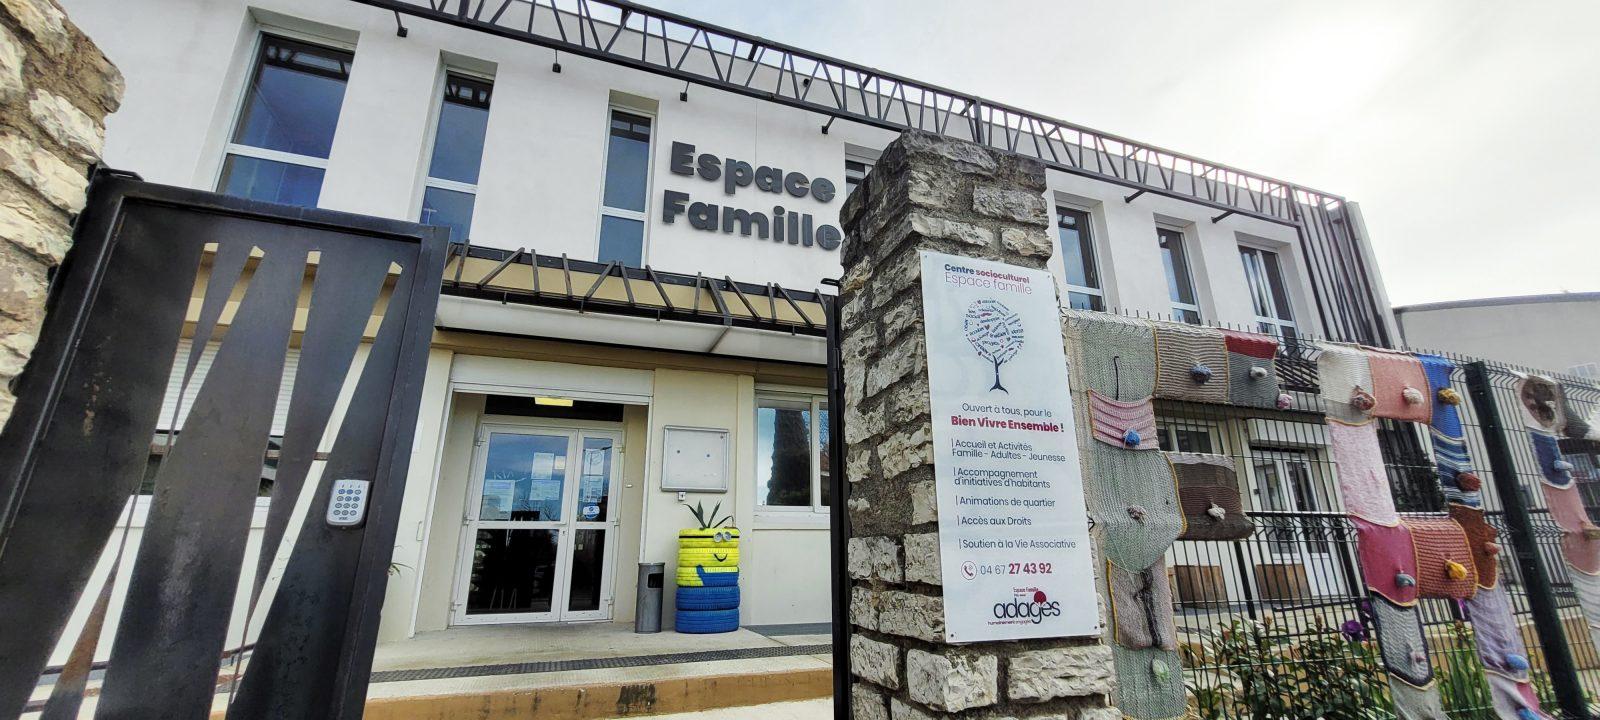 Espace famille, Montpellier